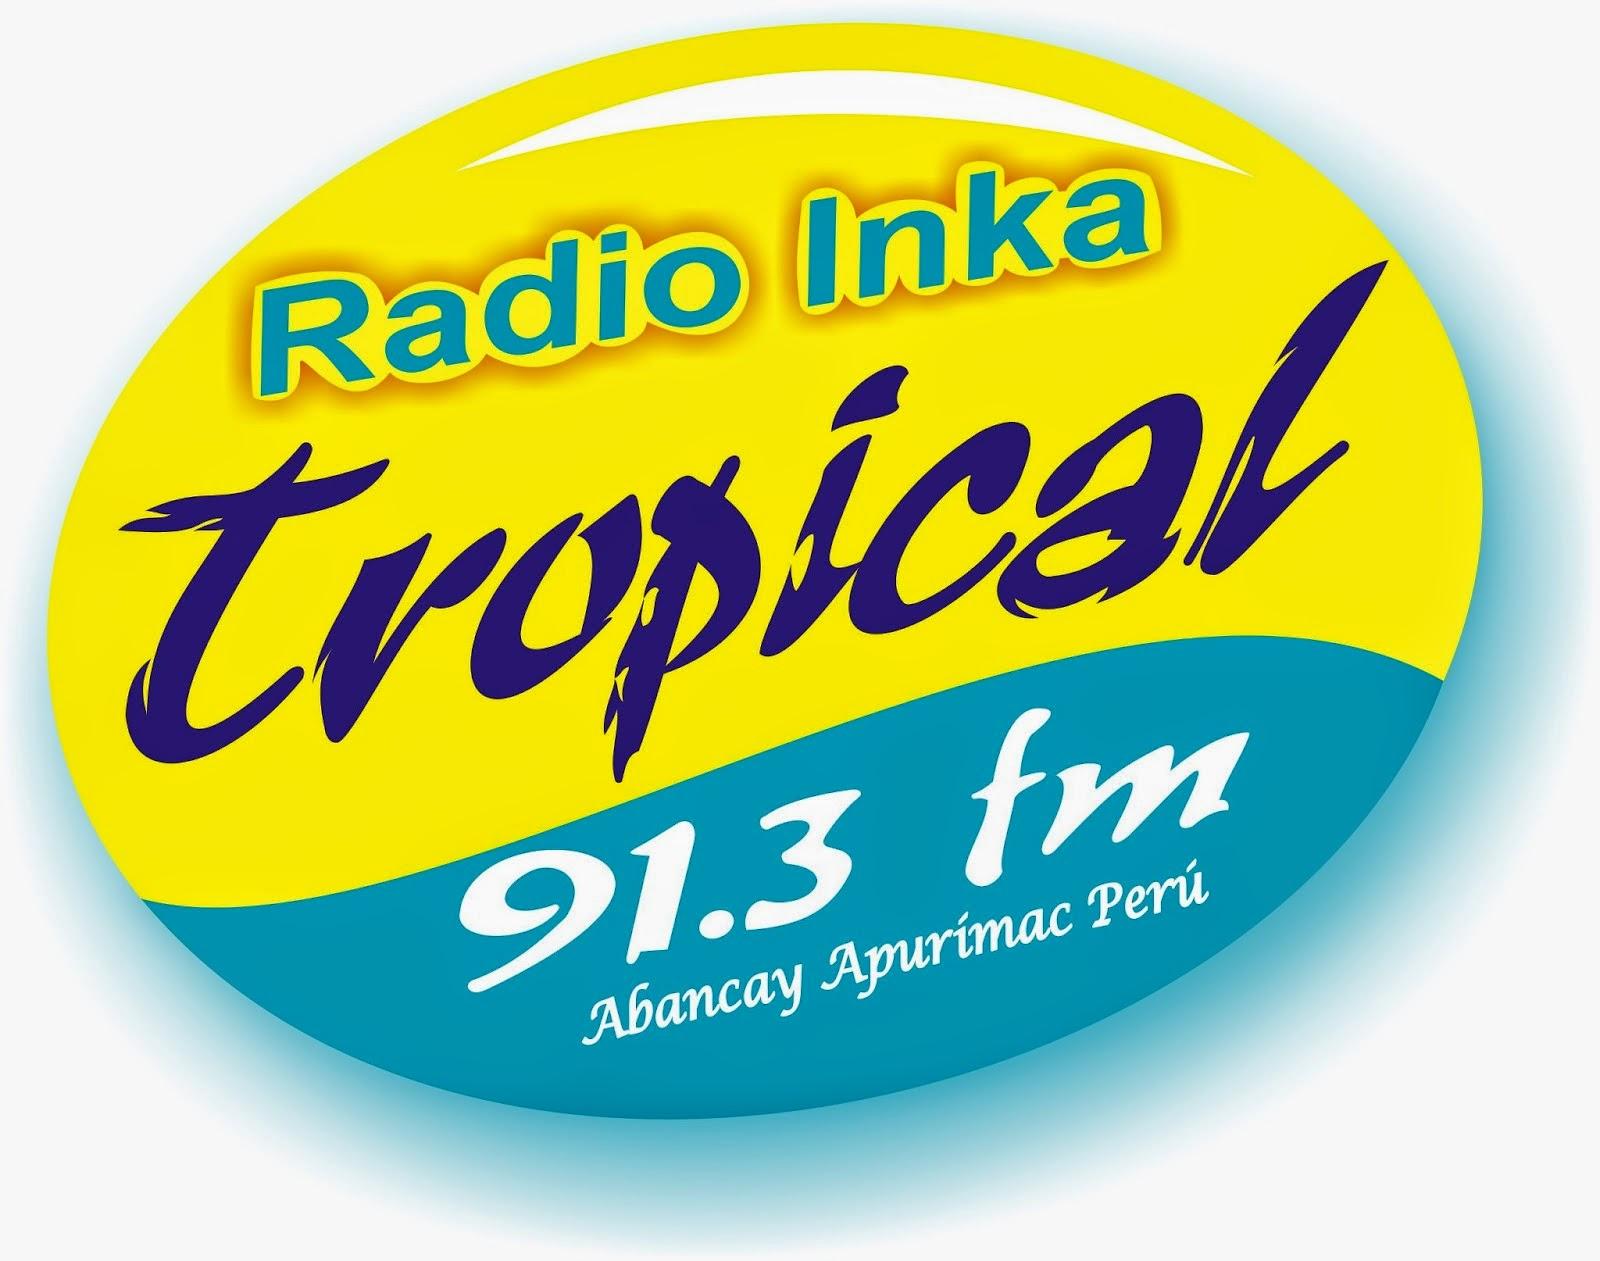 Radio Inka Tropical 91.3 FM Abancay